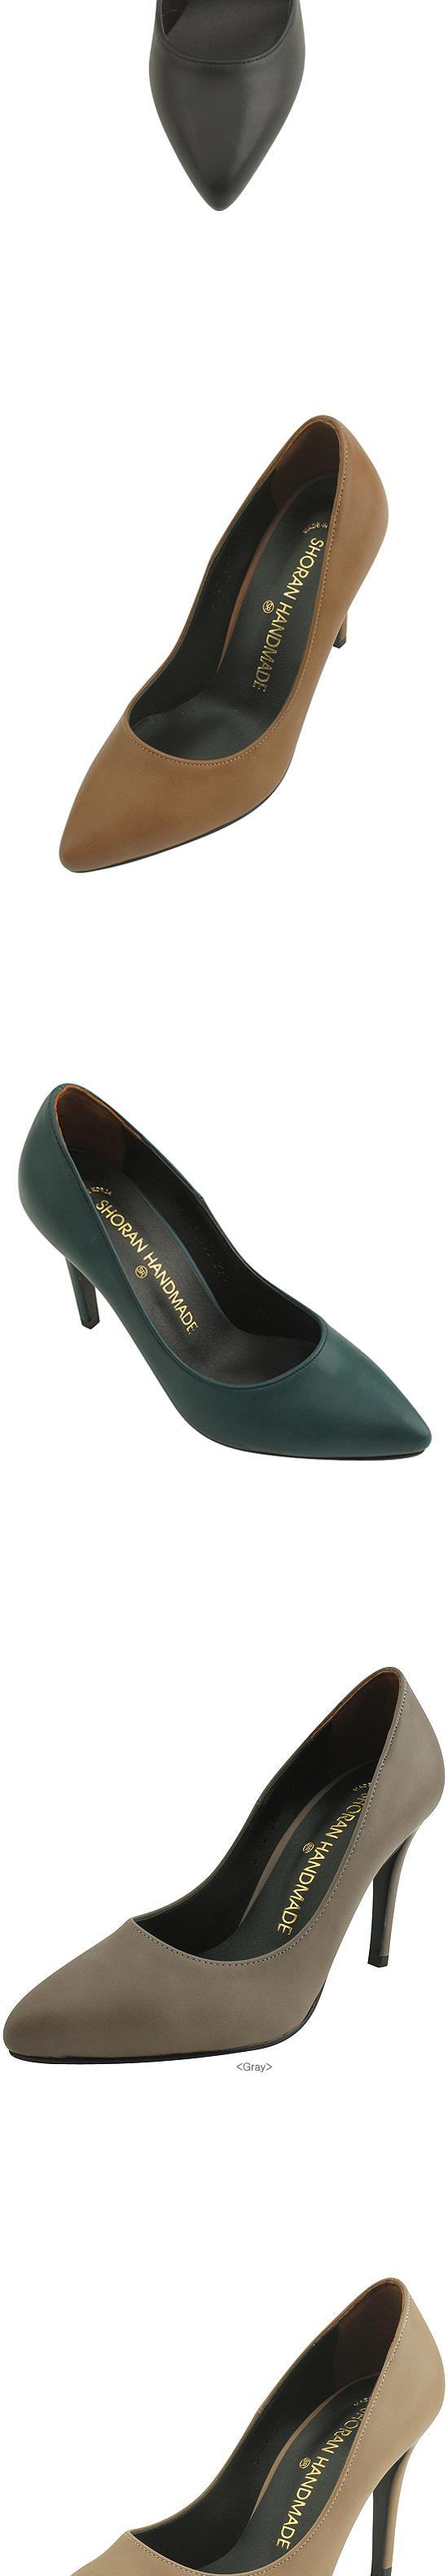 Minimalist Stiletto High Heels 9cm Black